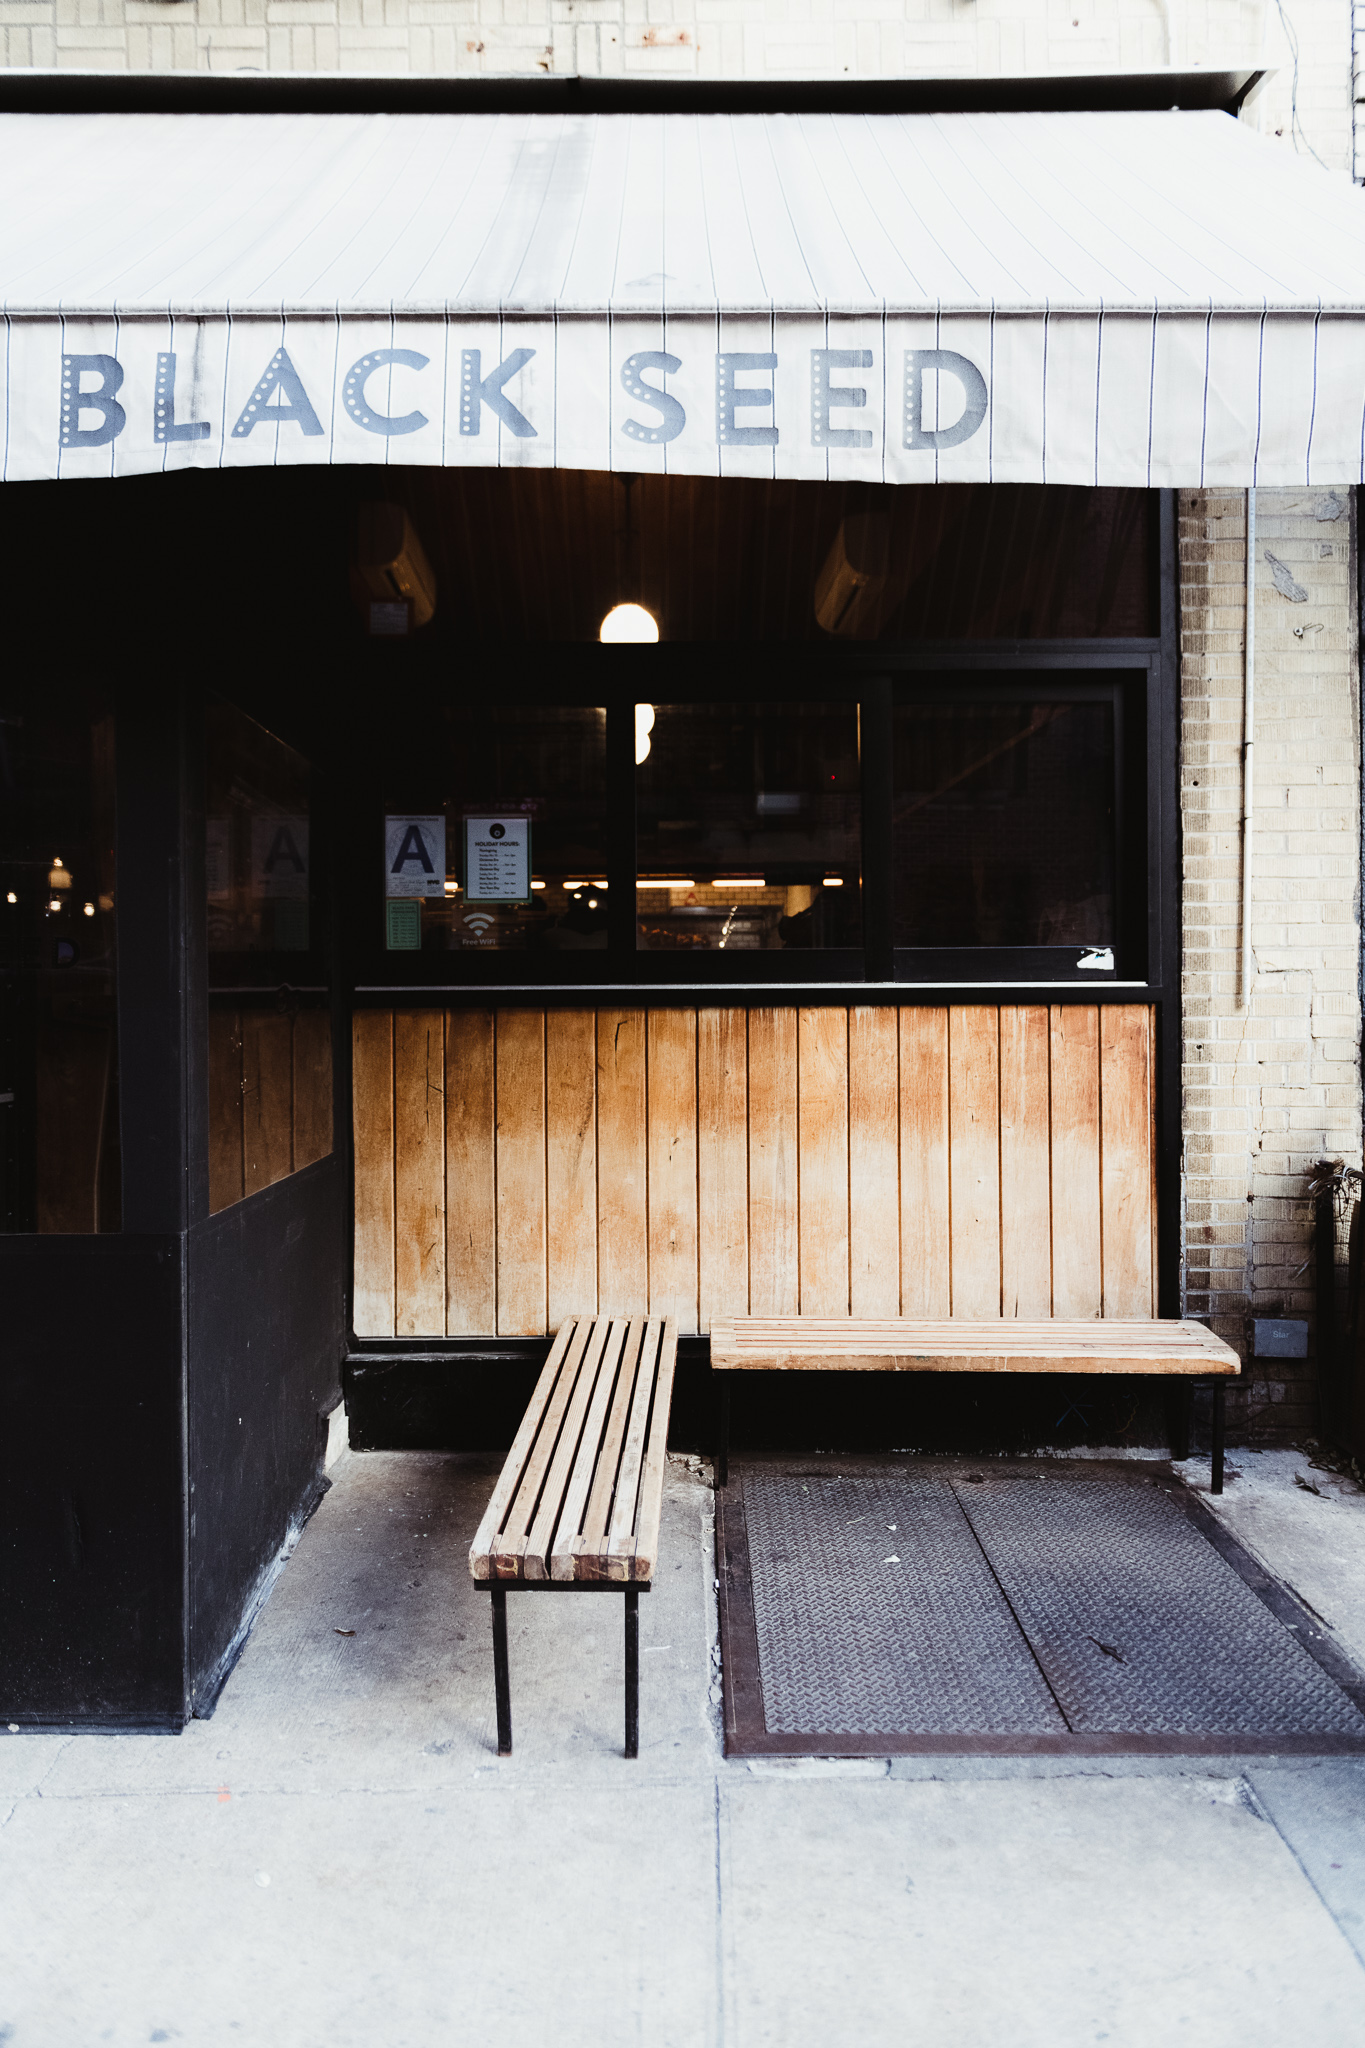 blackseedDSC_2133.jpg